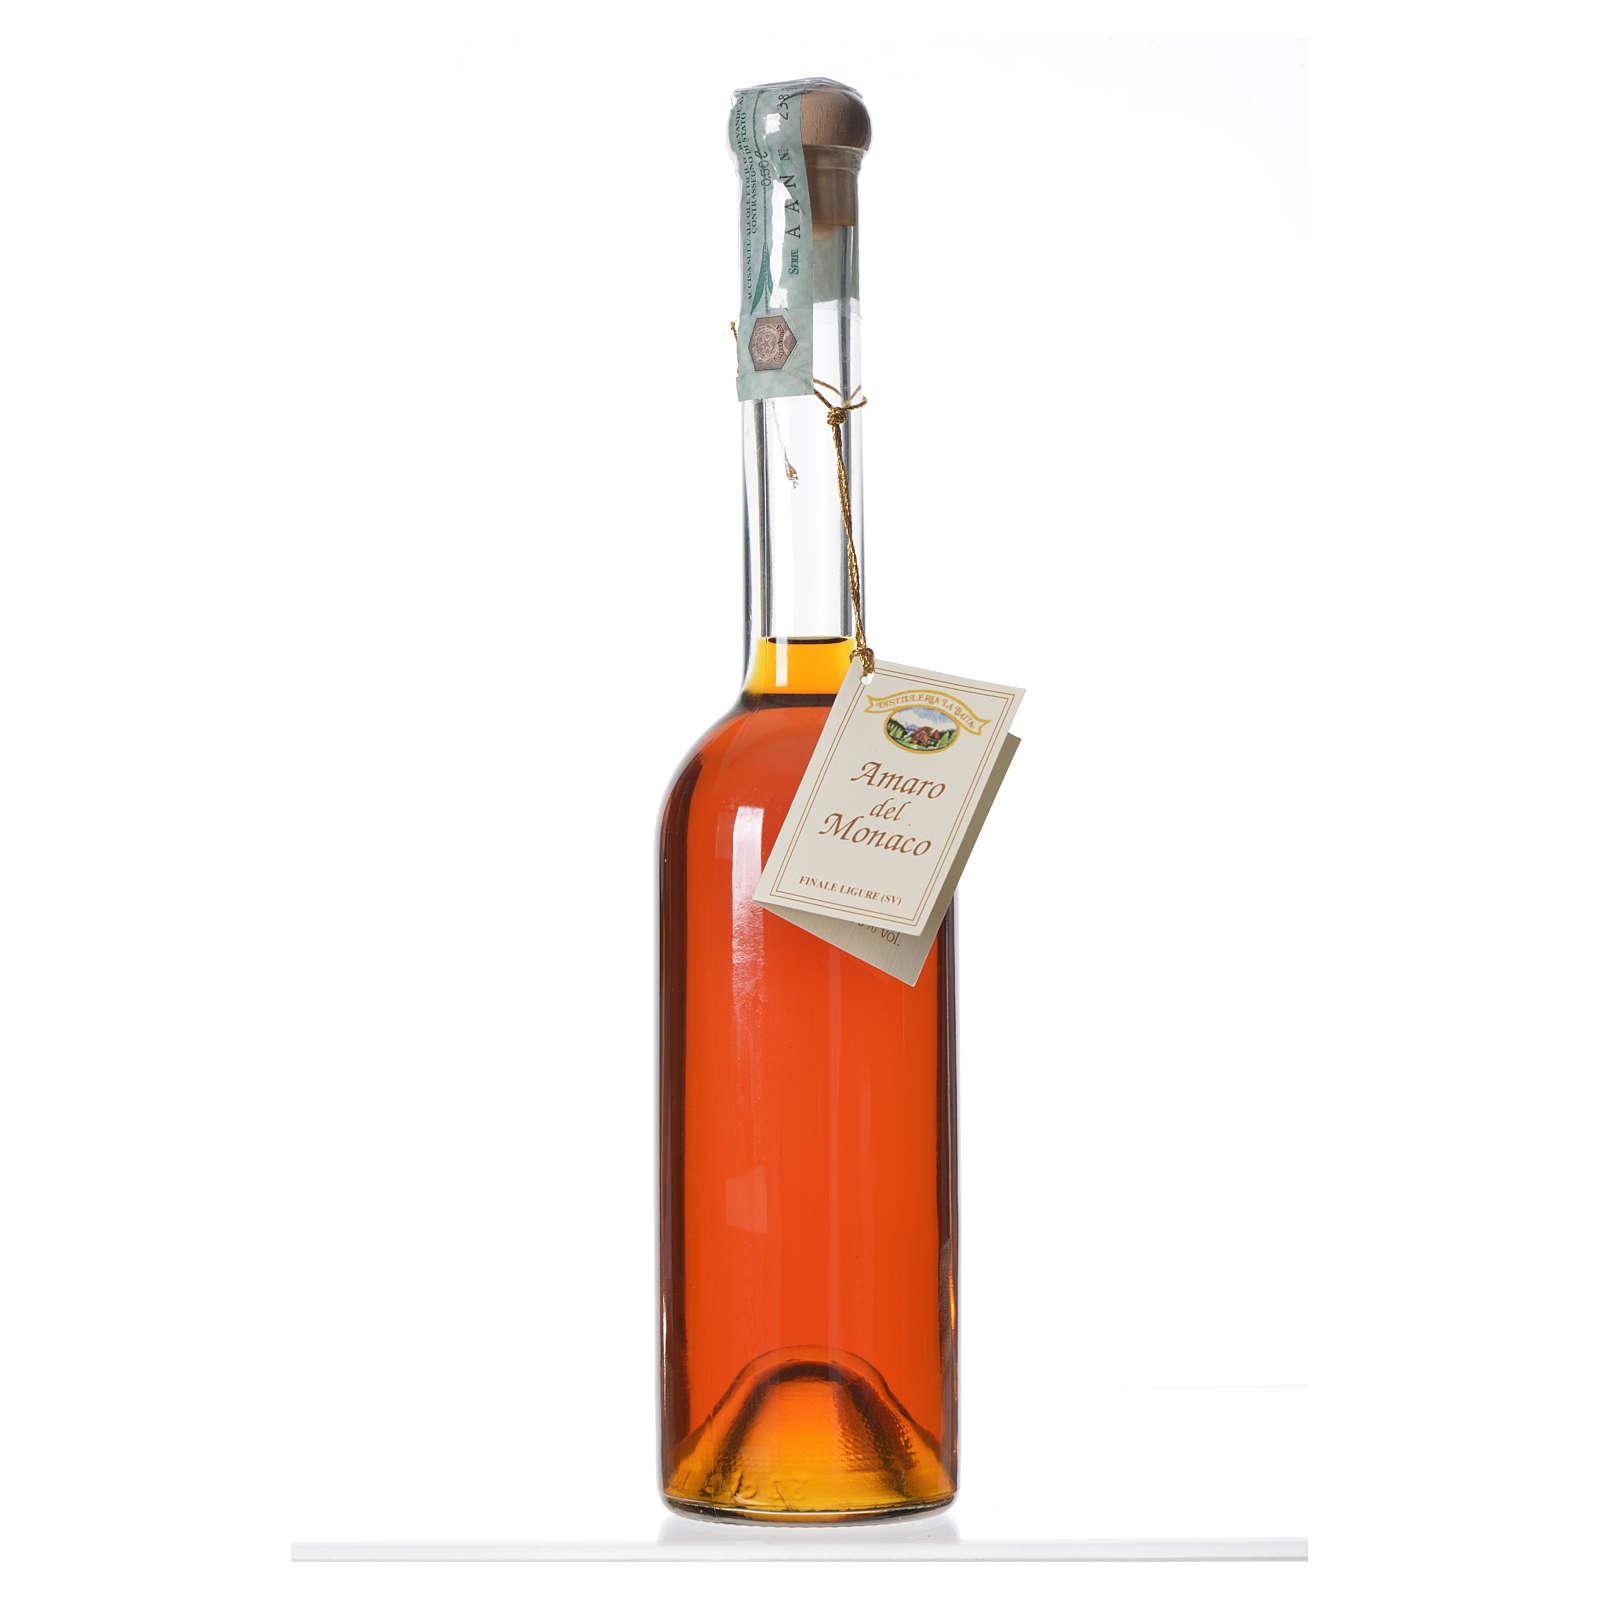 Magenbitter Amaro del Monaco 500ml Finale Ligure 3